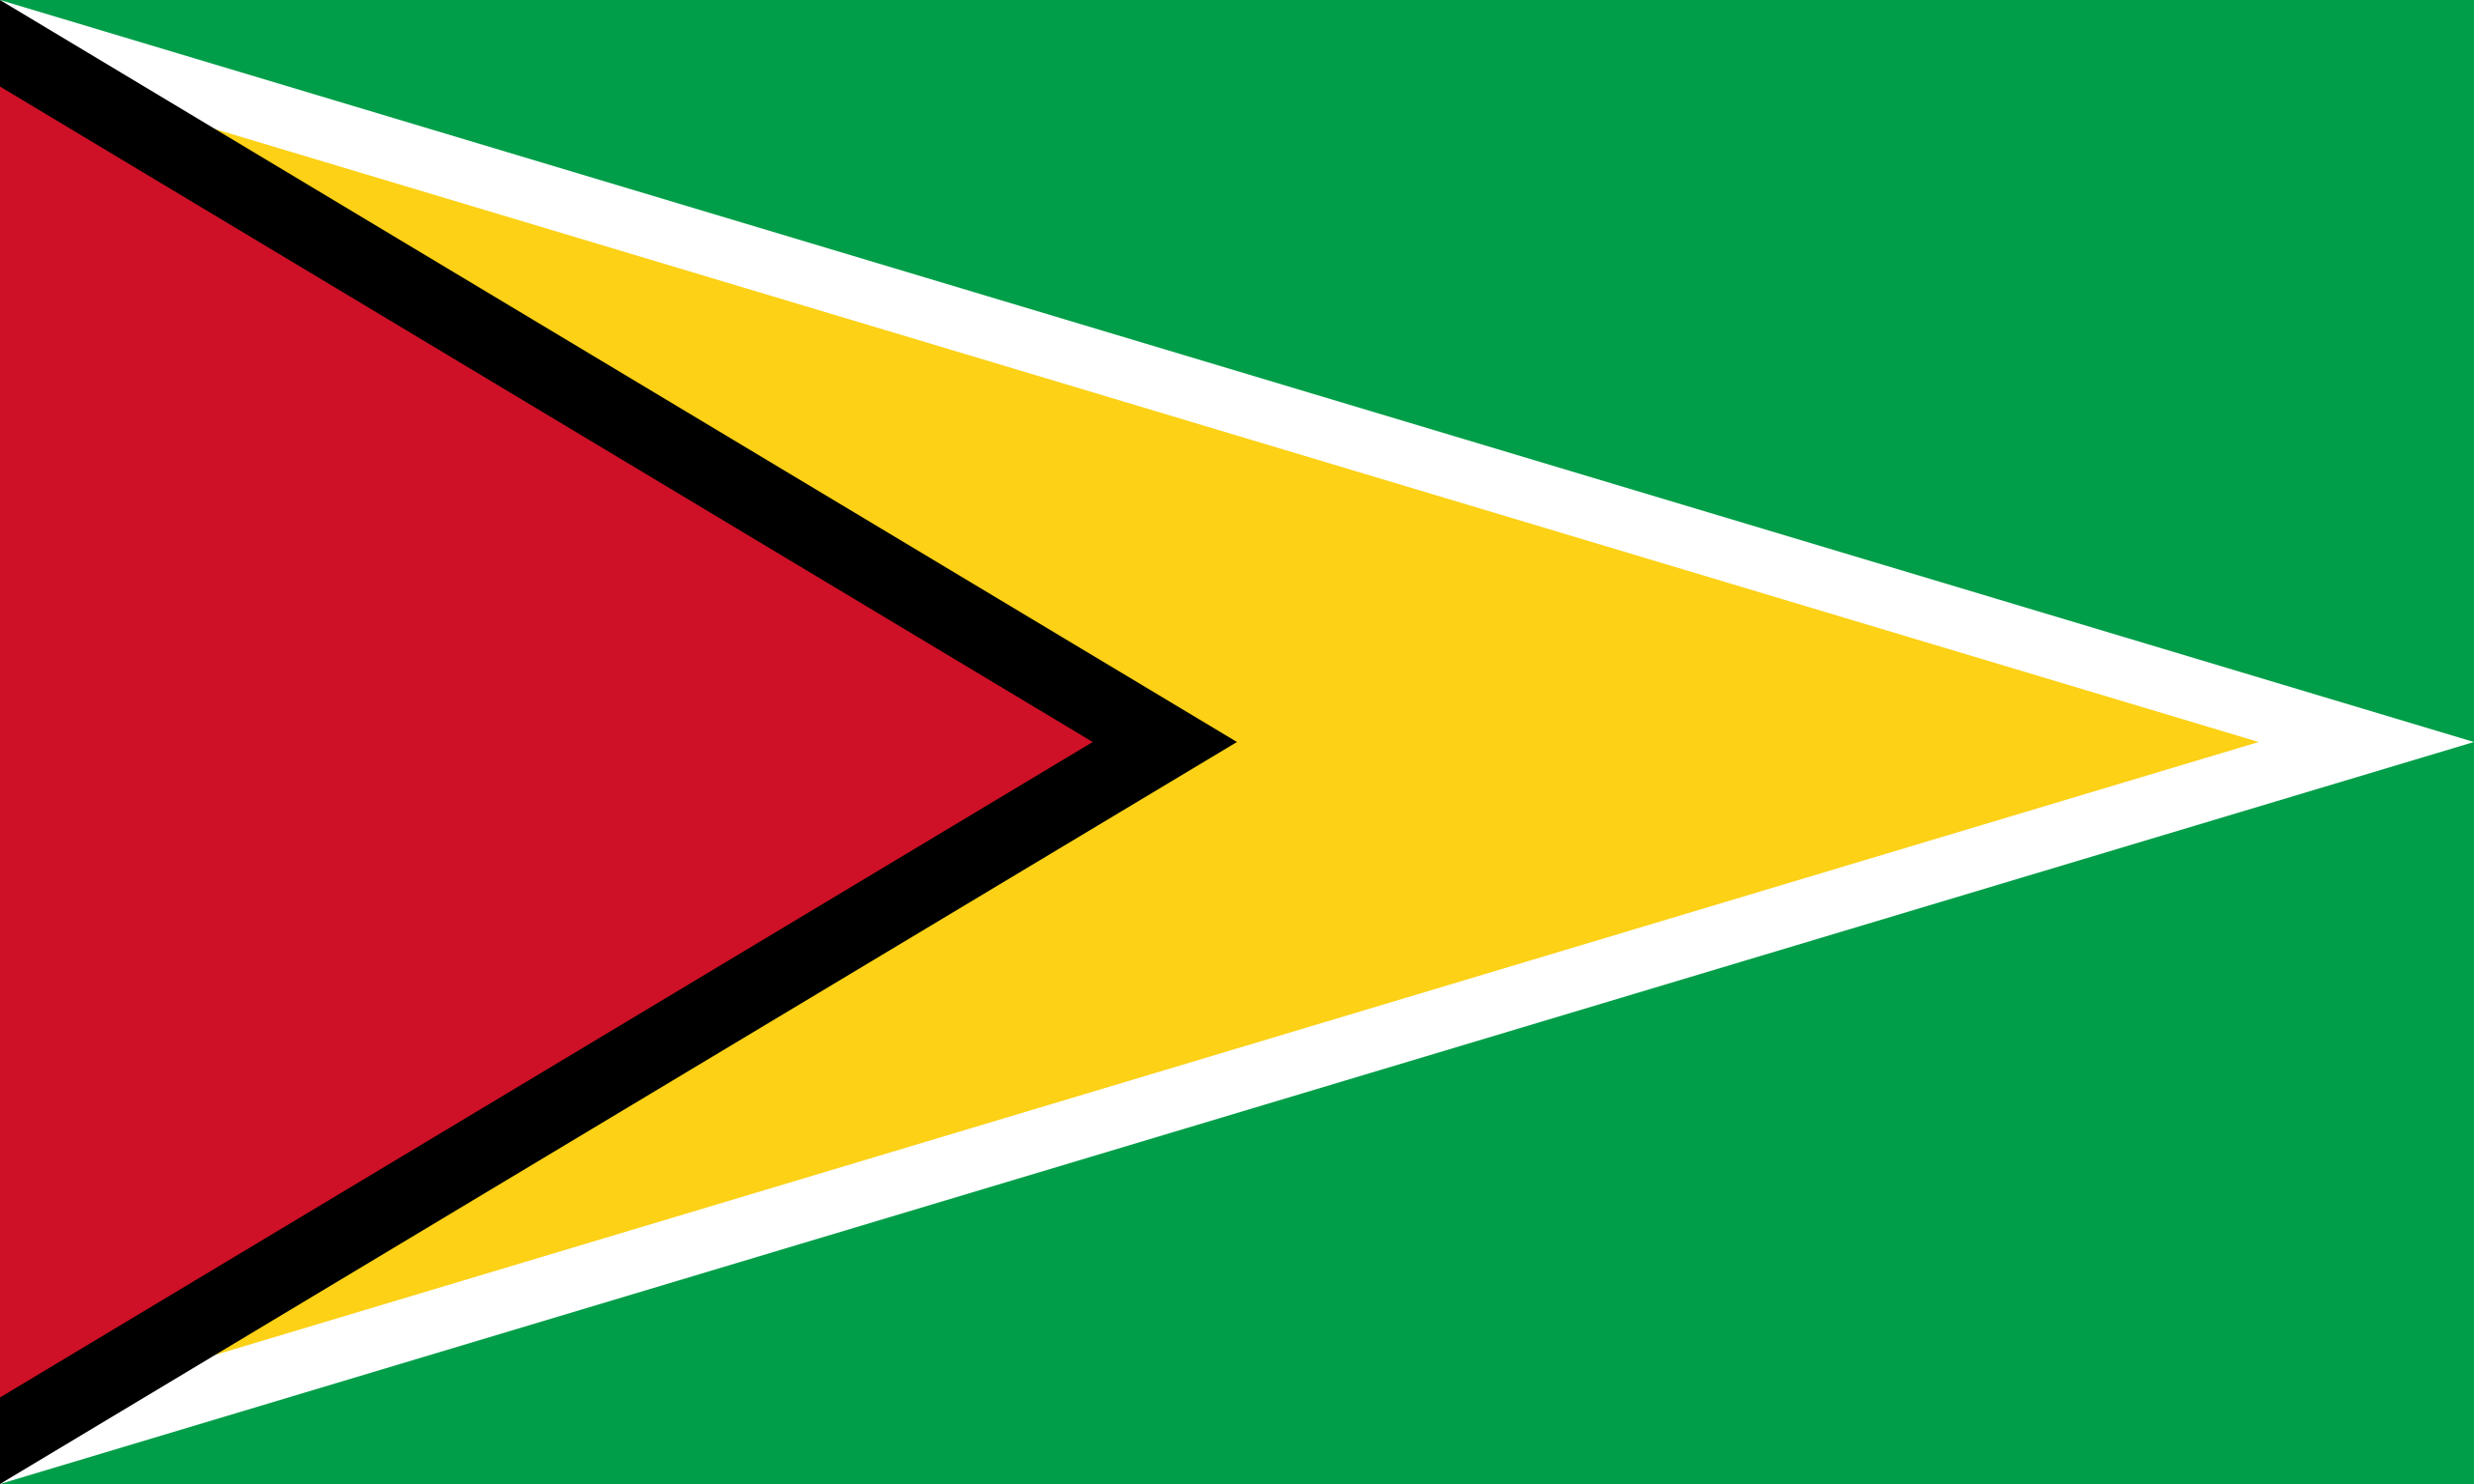 guyana, Land, Emblem, Logo, Symbol - Wallpaper HD - Prof.-falken.com